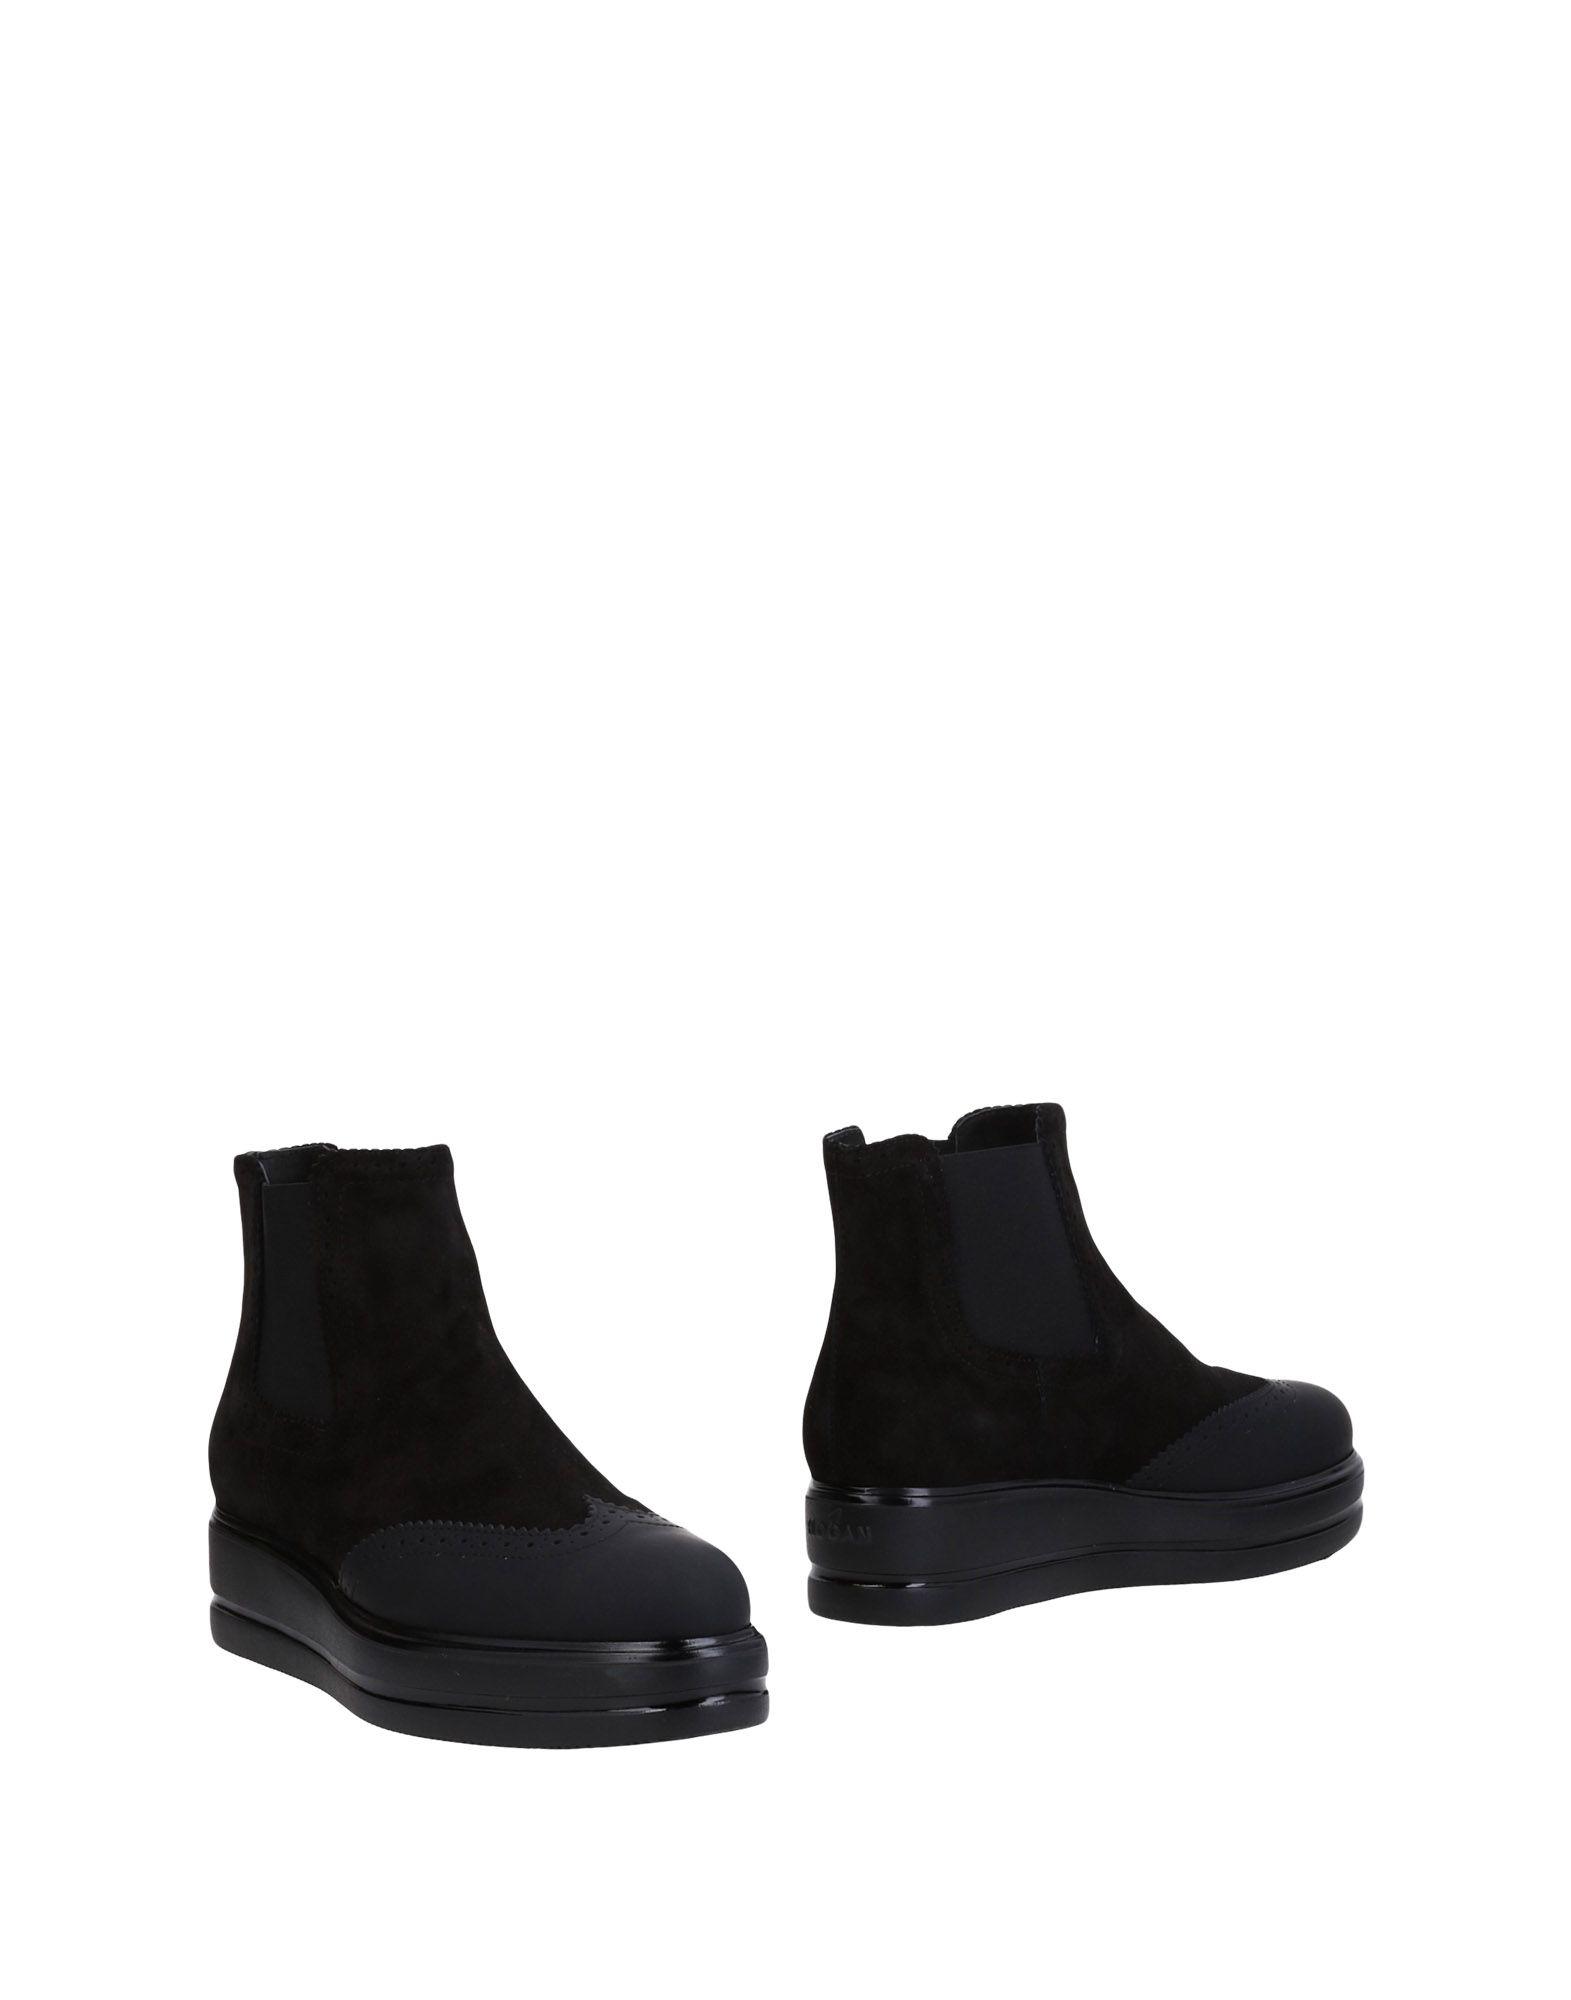 Bottillons Hogan Femme - Bottillons Hogan Noir Chaussures casual sauvages